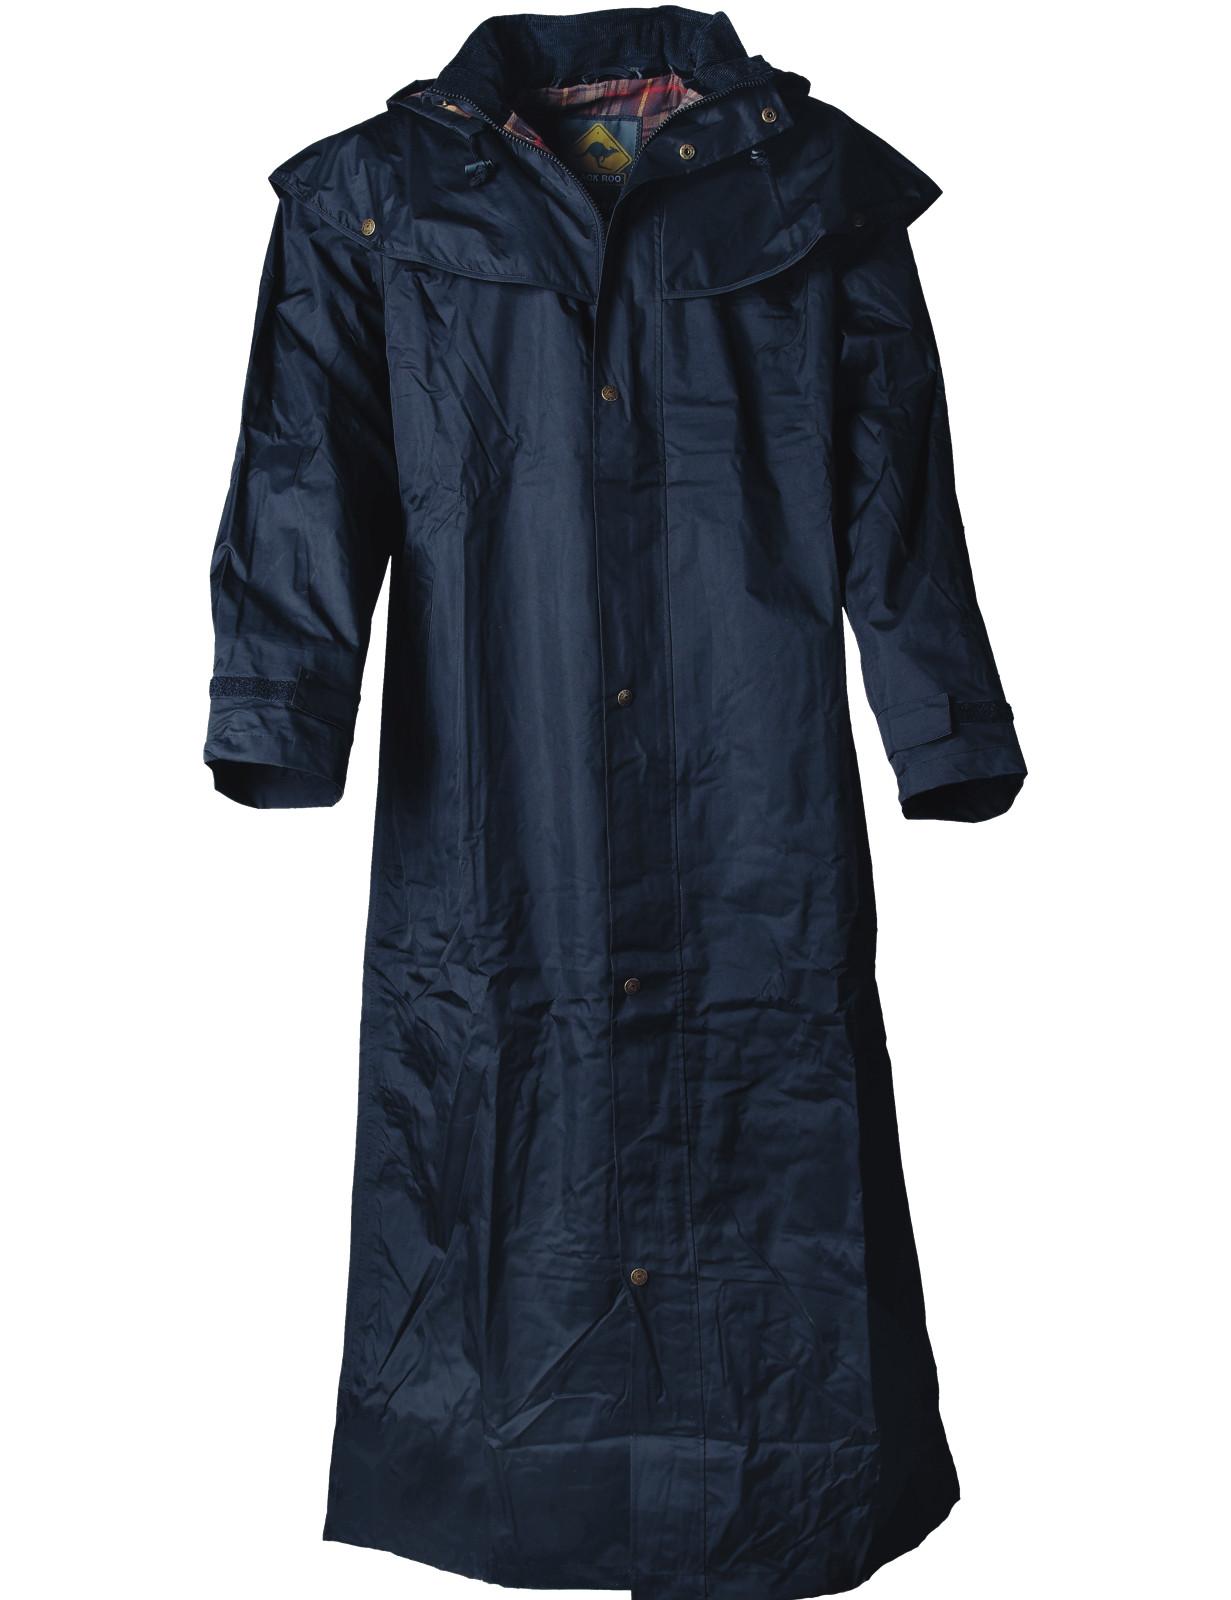 Black Roo »Stockman Coat« Mantel für Cowboys Biker SCHWARZ